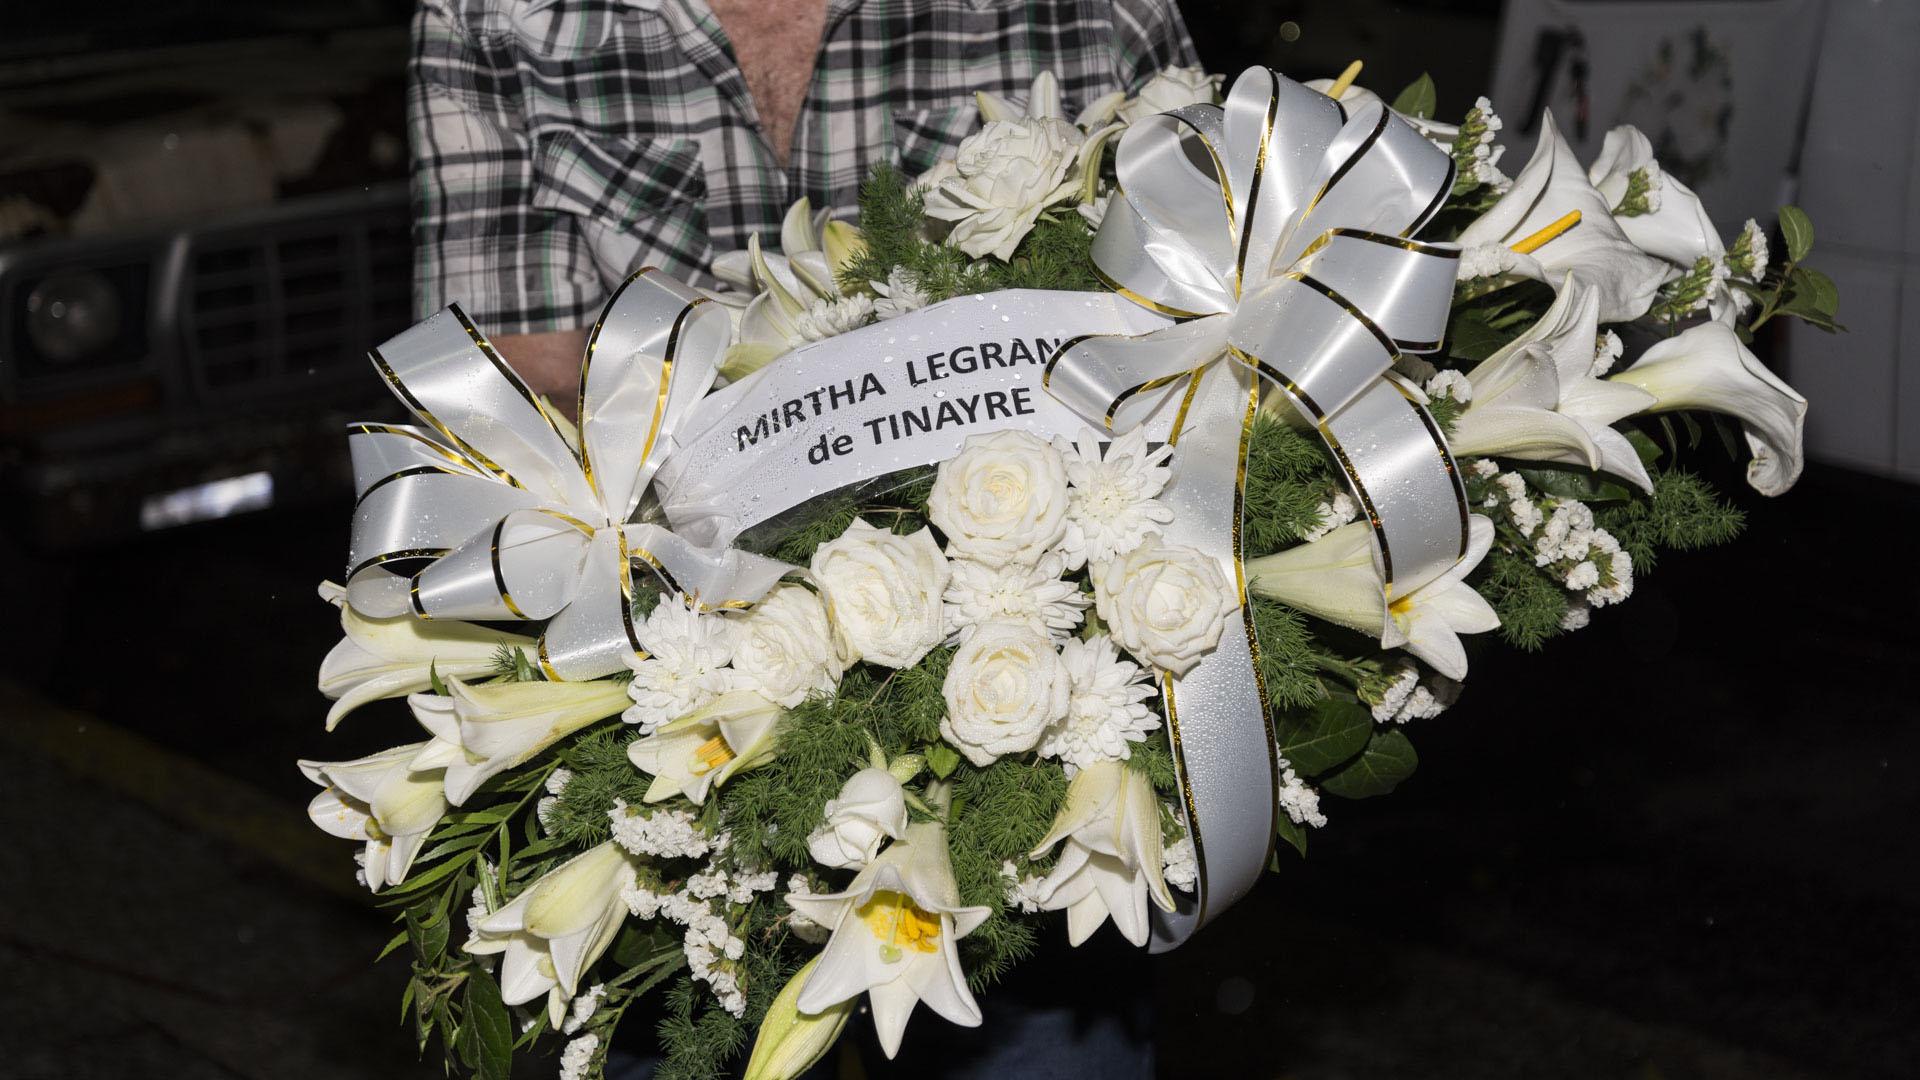 La corona funebre enviada por Mirtha Legrand